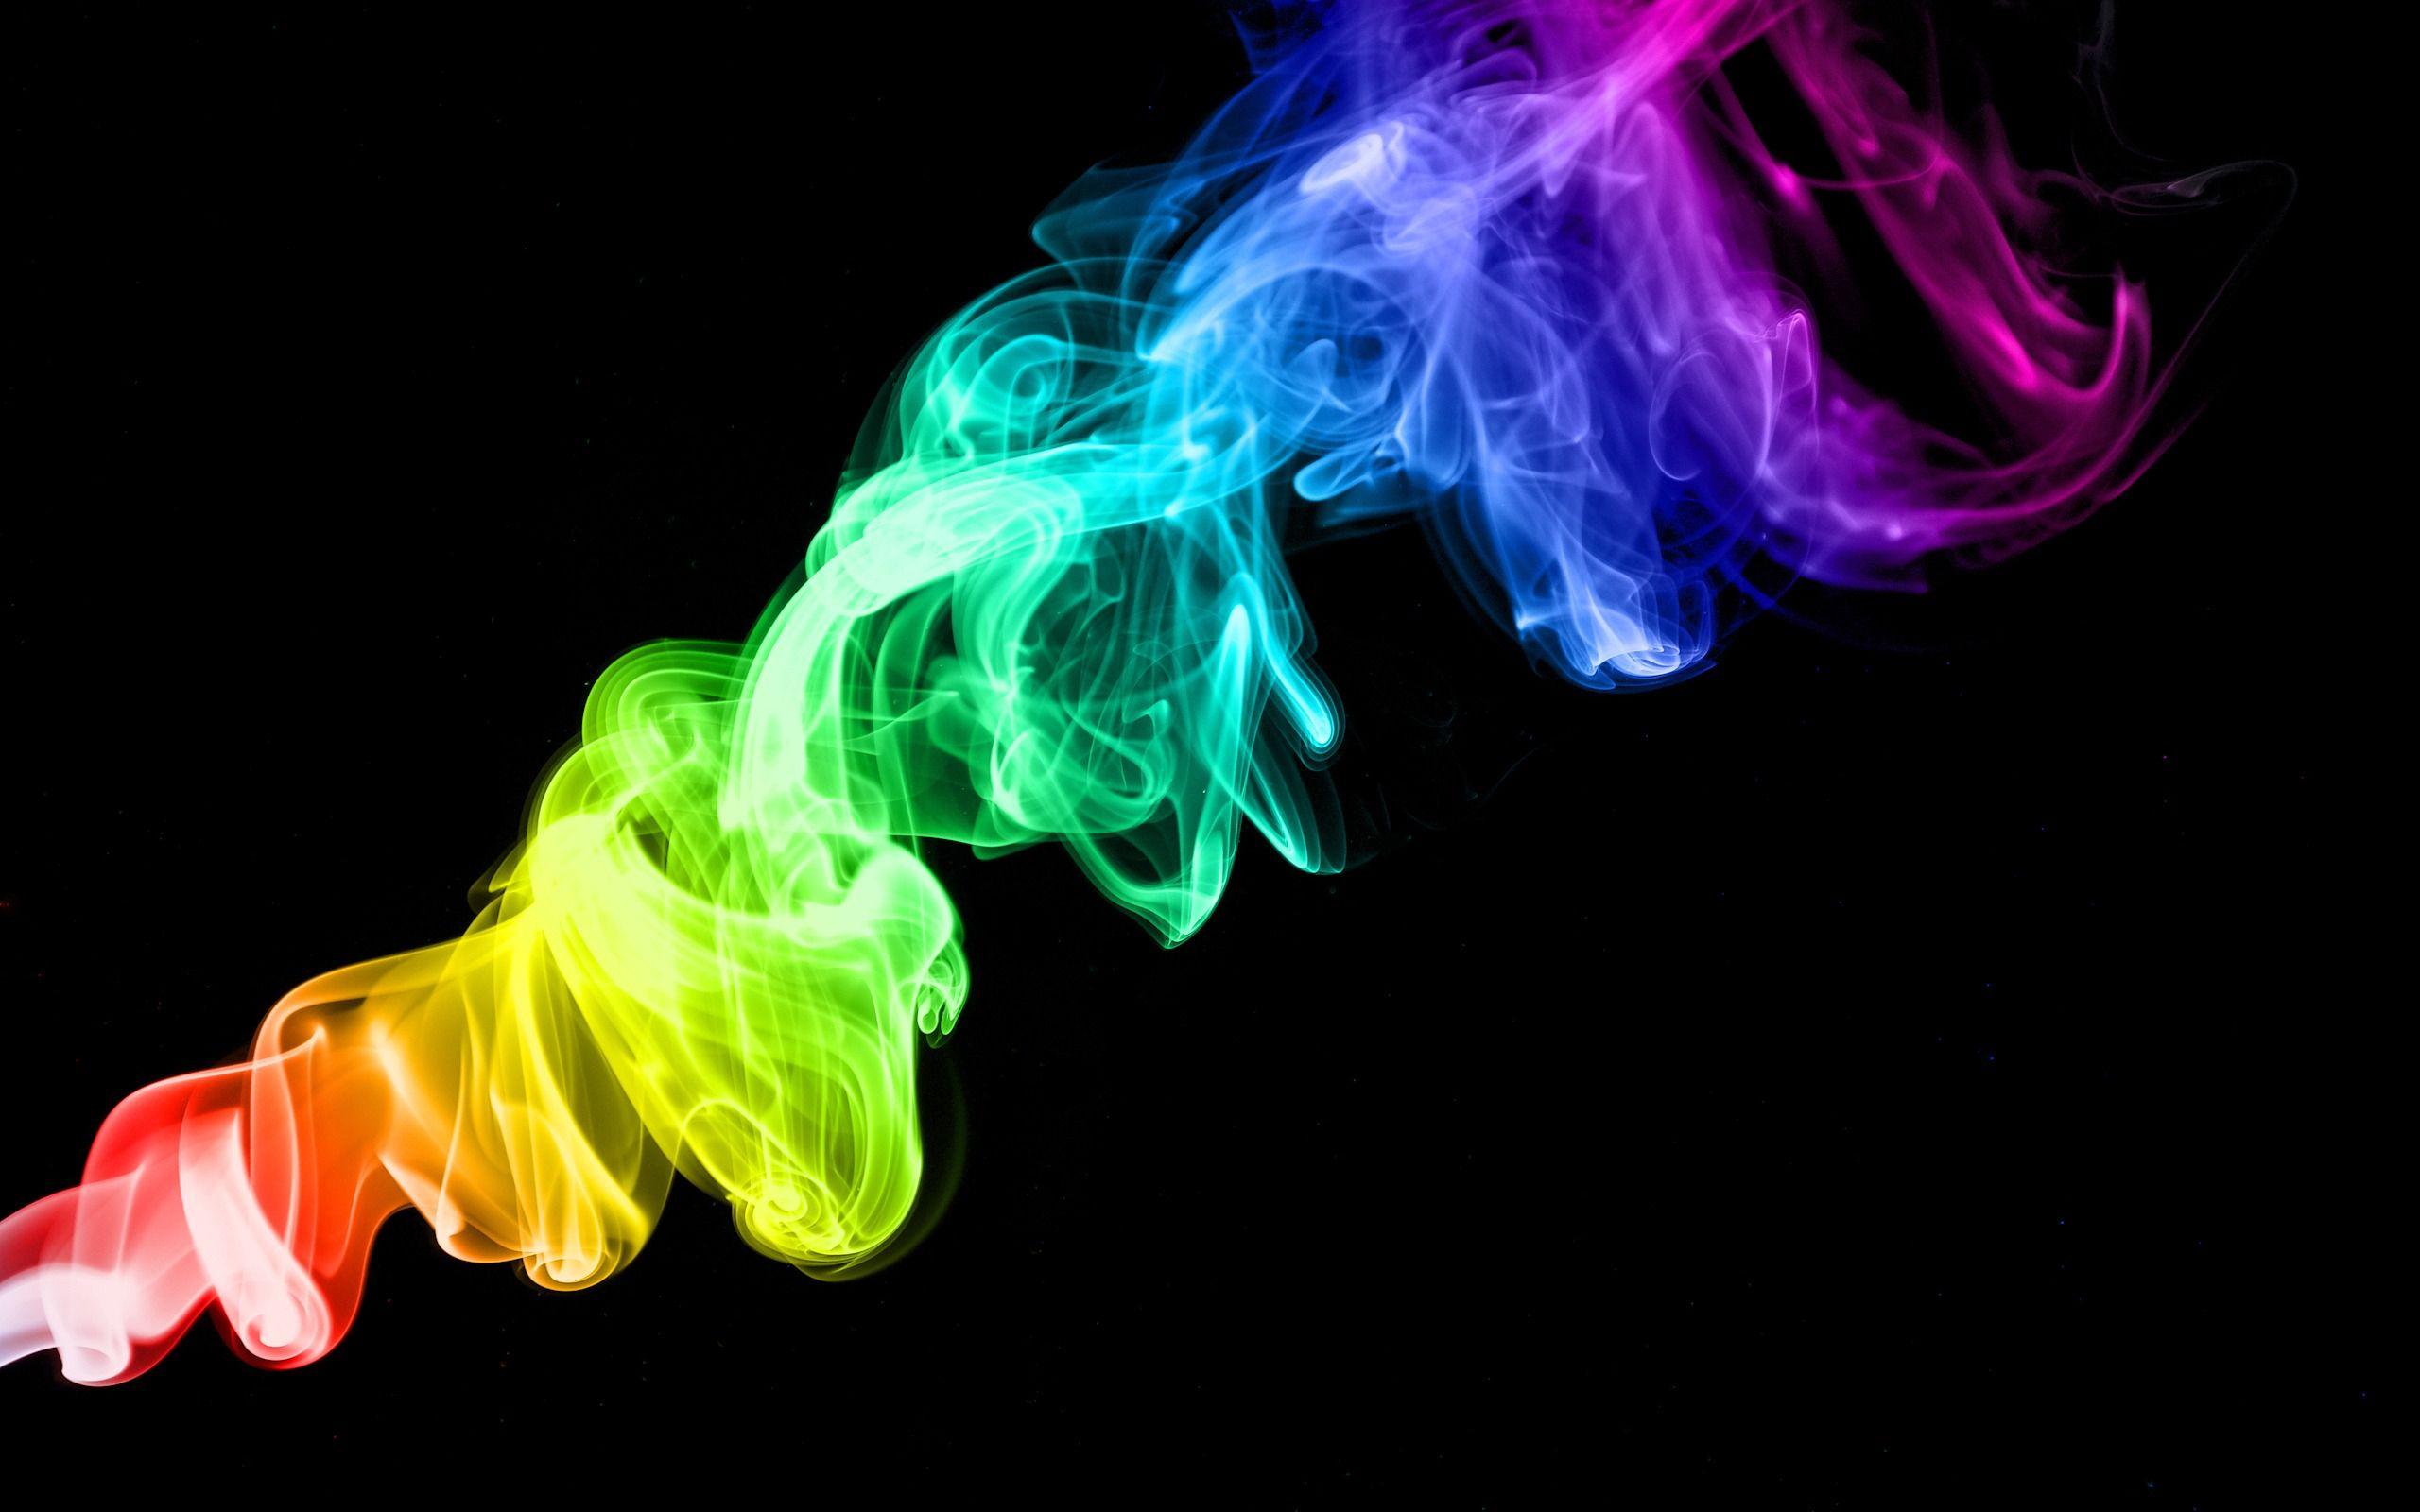 Colorful Smoke In The Air Smoke Wallpaper Smoke Background Rainbow Wallpaper